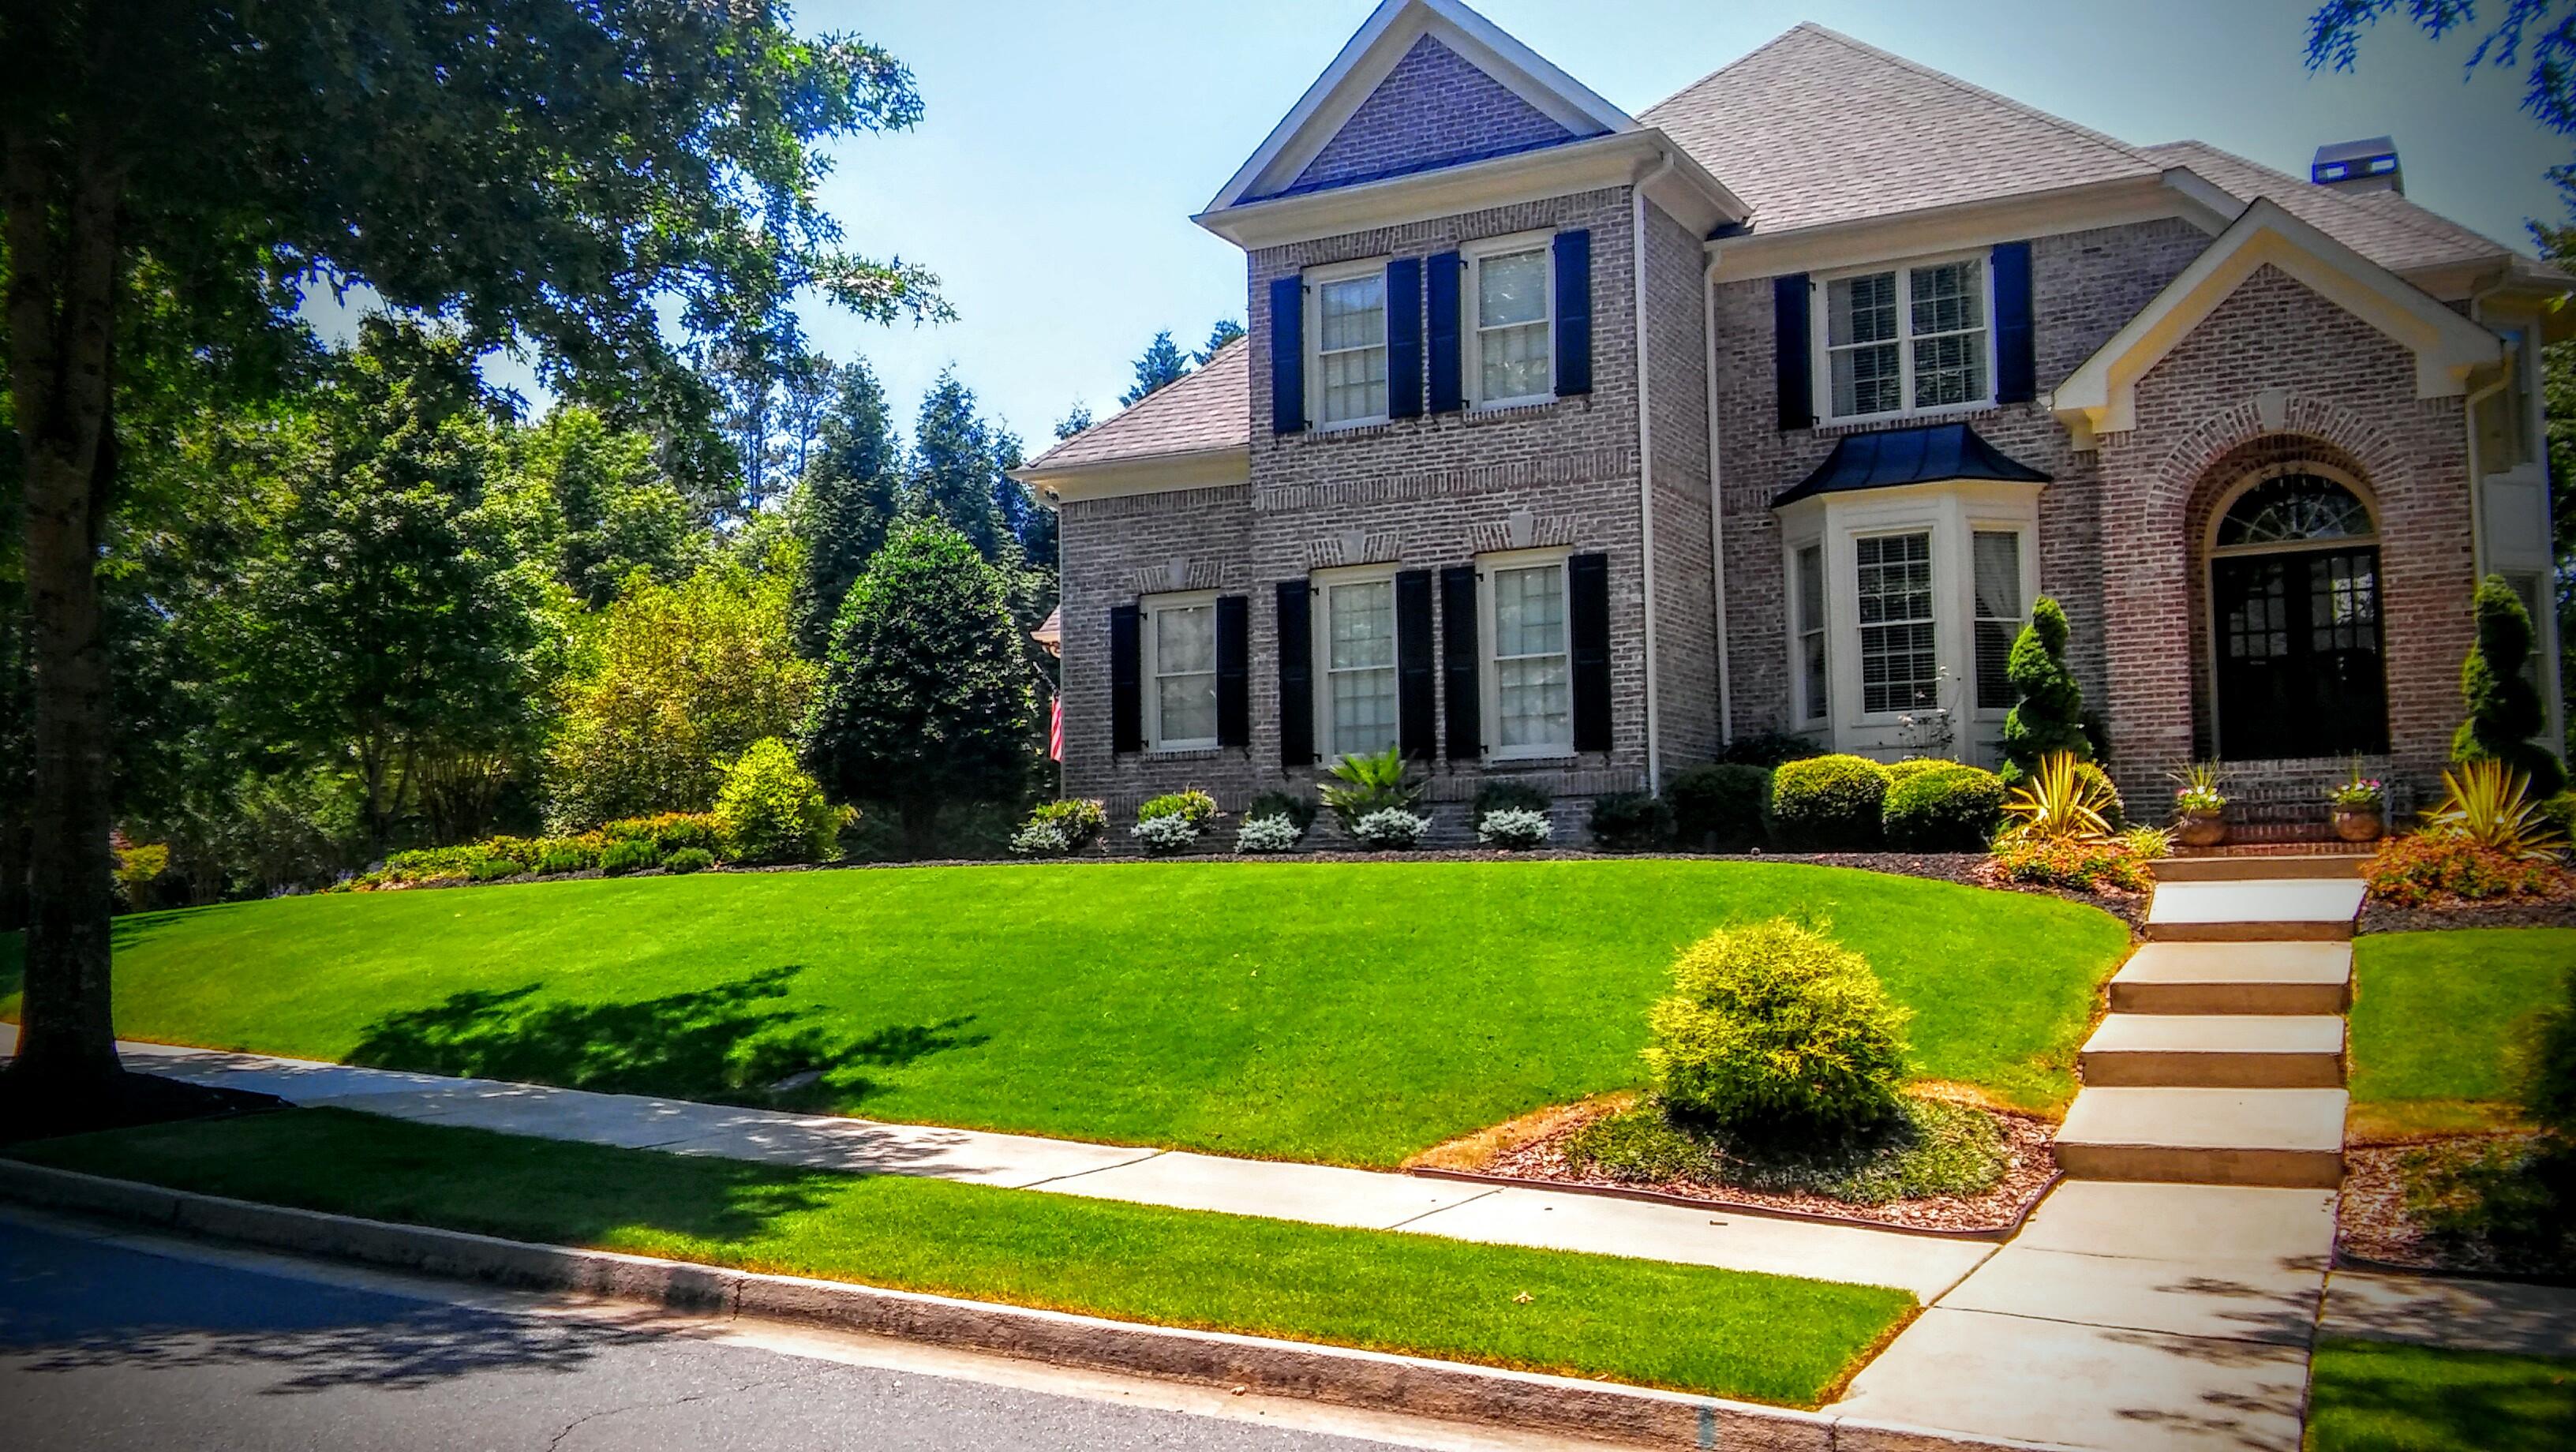 Order Lawn Care in Buford, GA, 30518